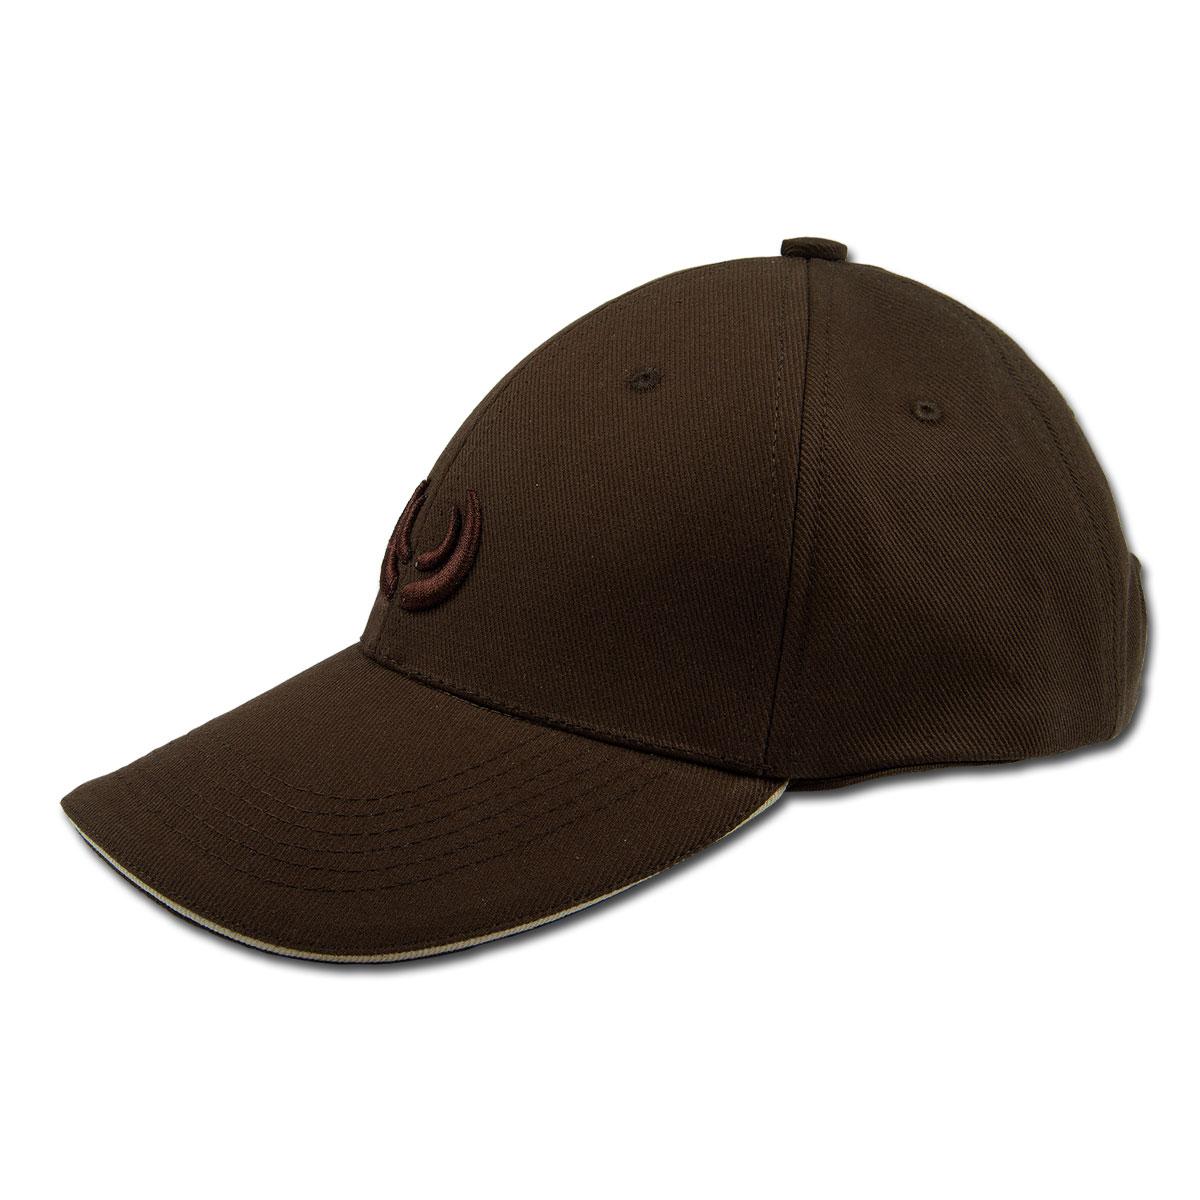 KEYLER Cap Dunkelbraun im Pareyshop